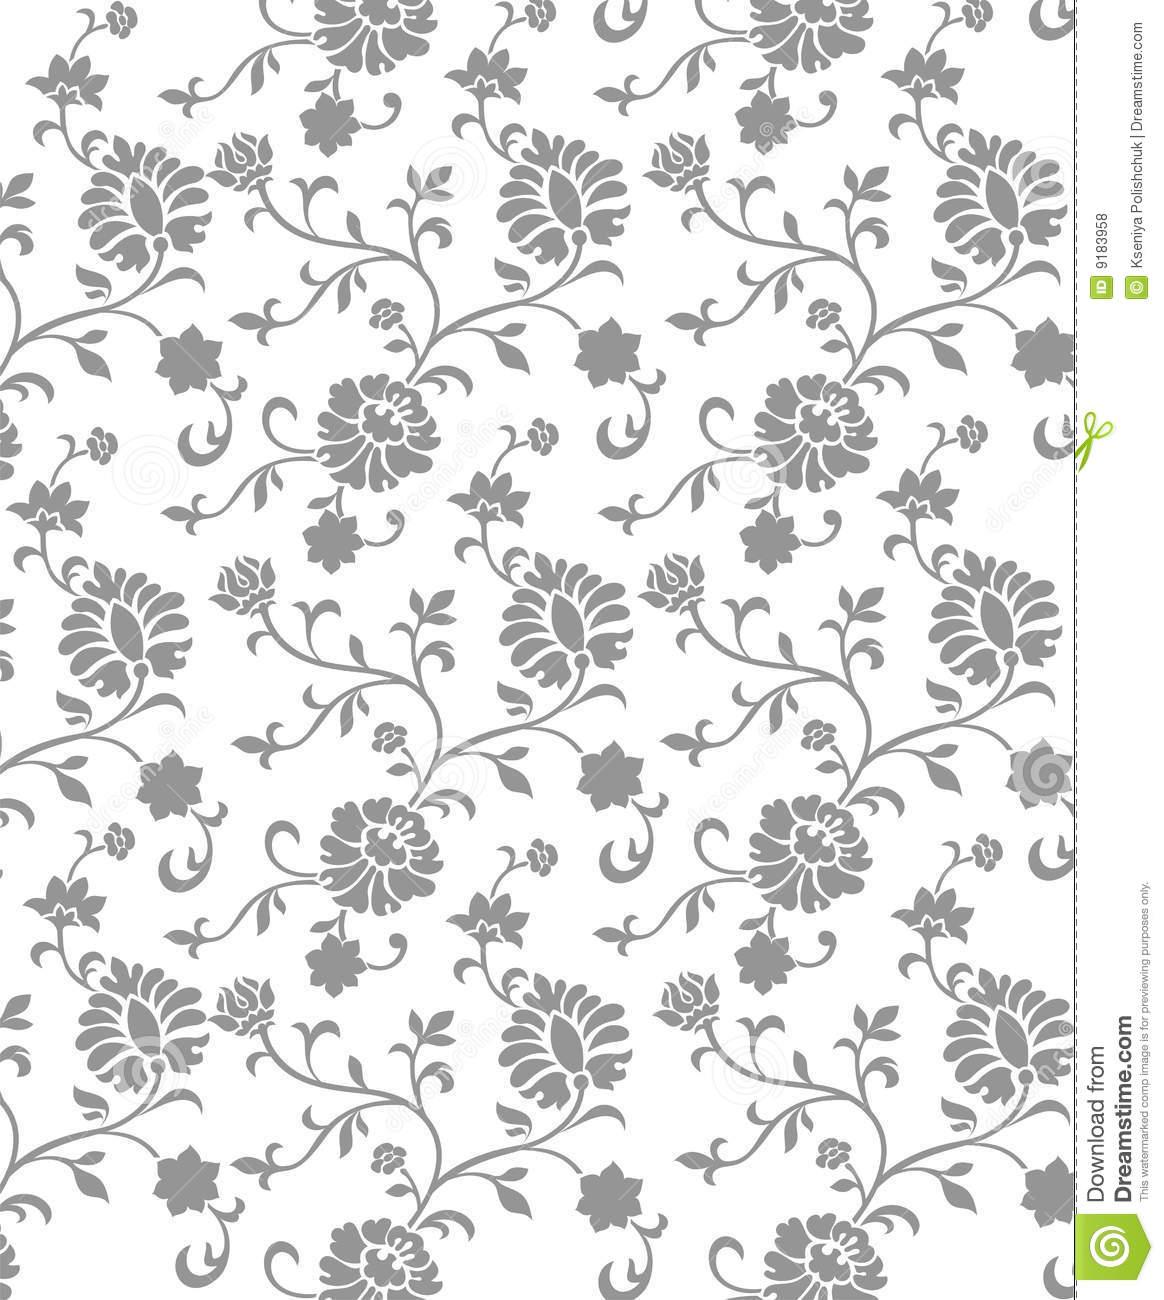 Free Download Gray Floral Backgrounds Grey Flower Floral